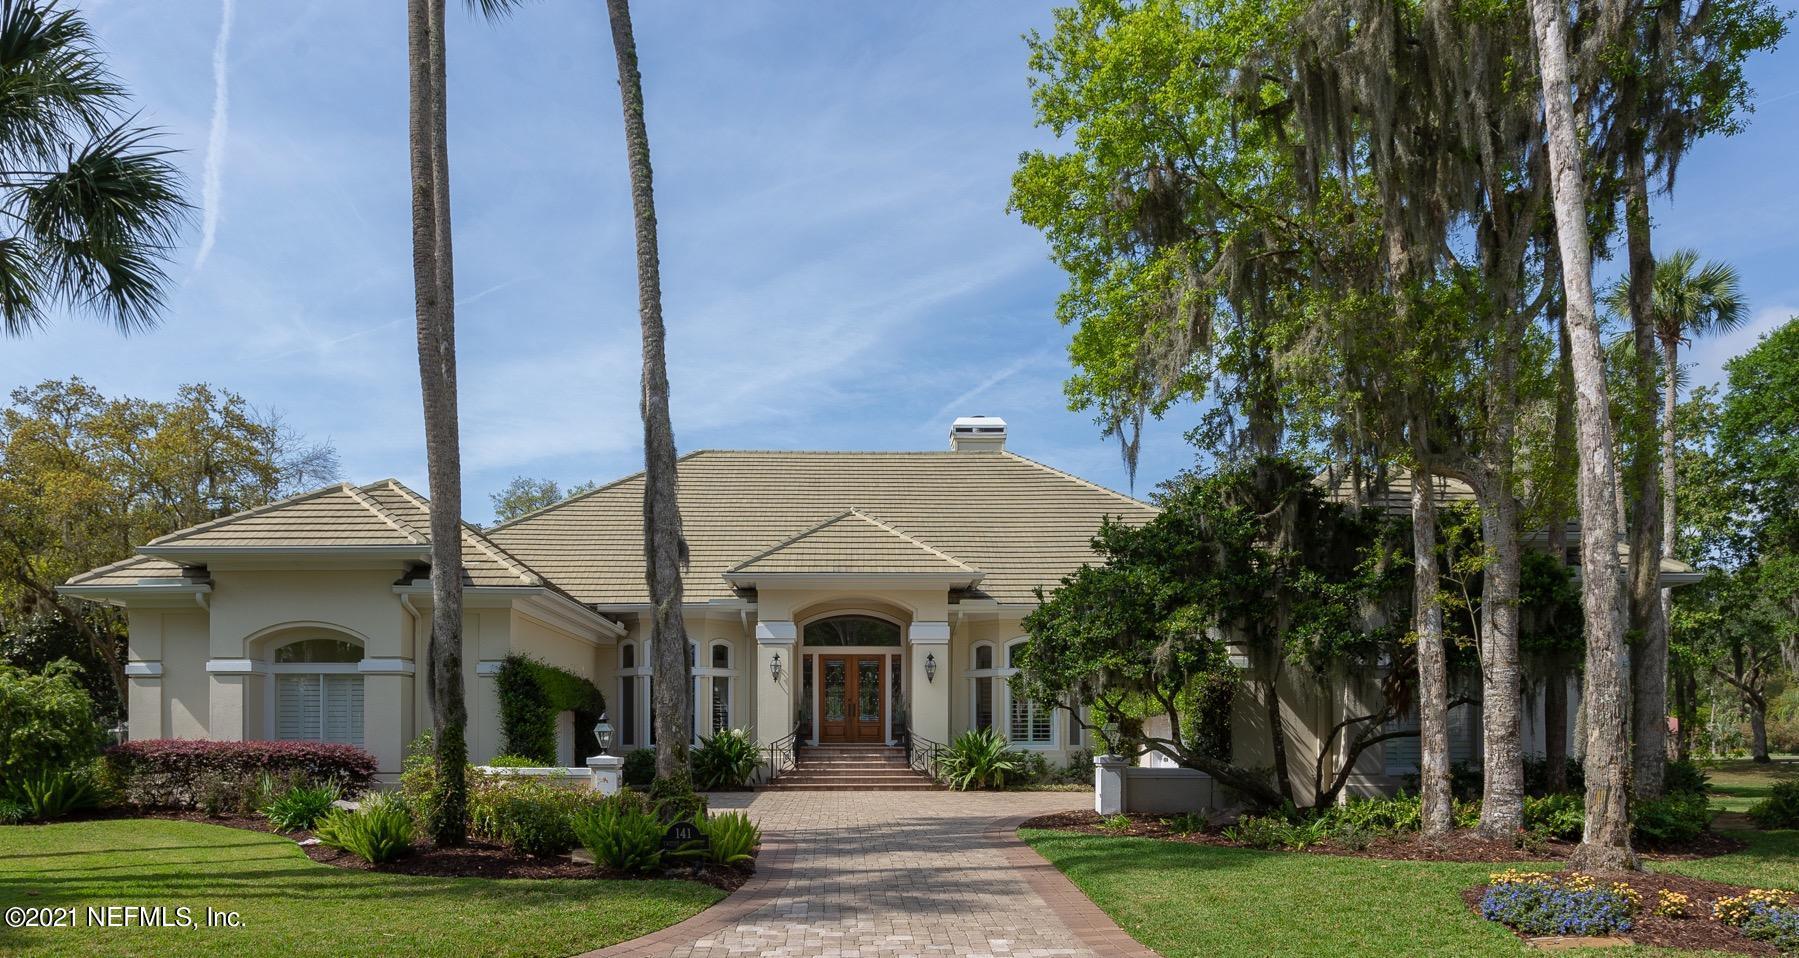 Details for 141 Twelve Oaks Ln, PONTE VEDRA BEACH, FL 32082